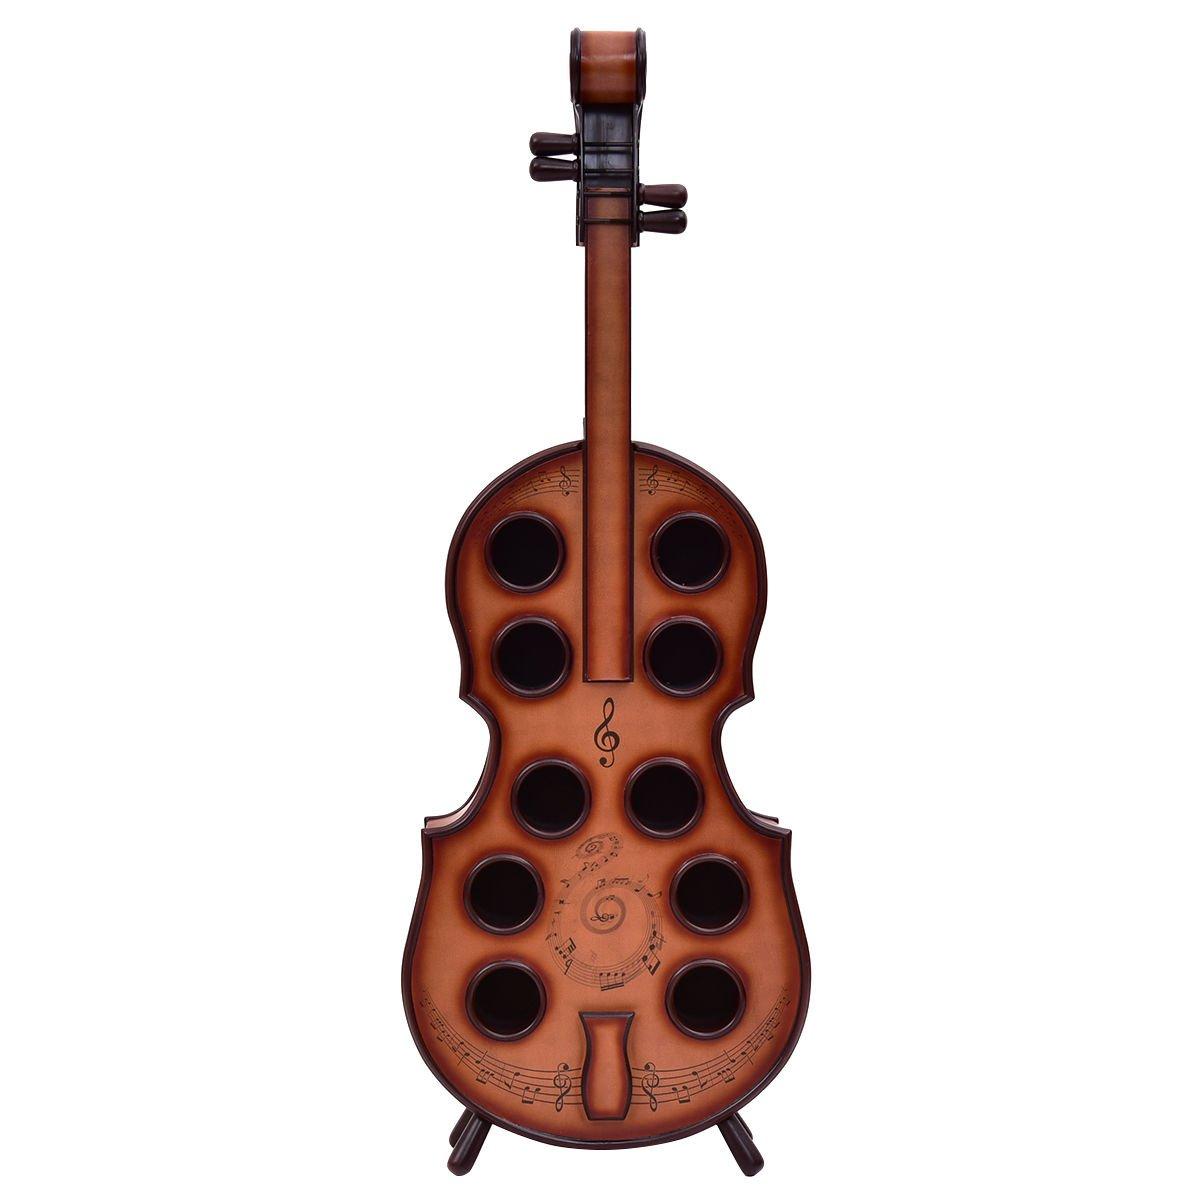 Wine Rack Violin Cello 10 Bottles Holder 16th Century Liquor Shelf Wood Eramaix